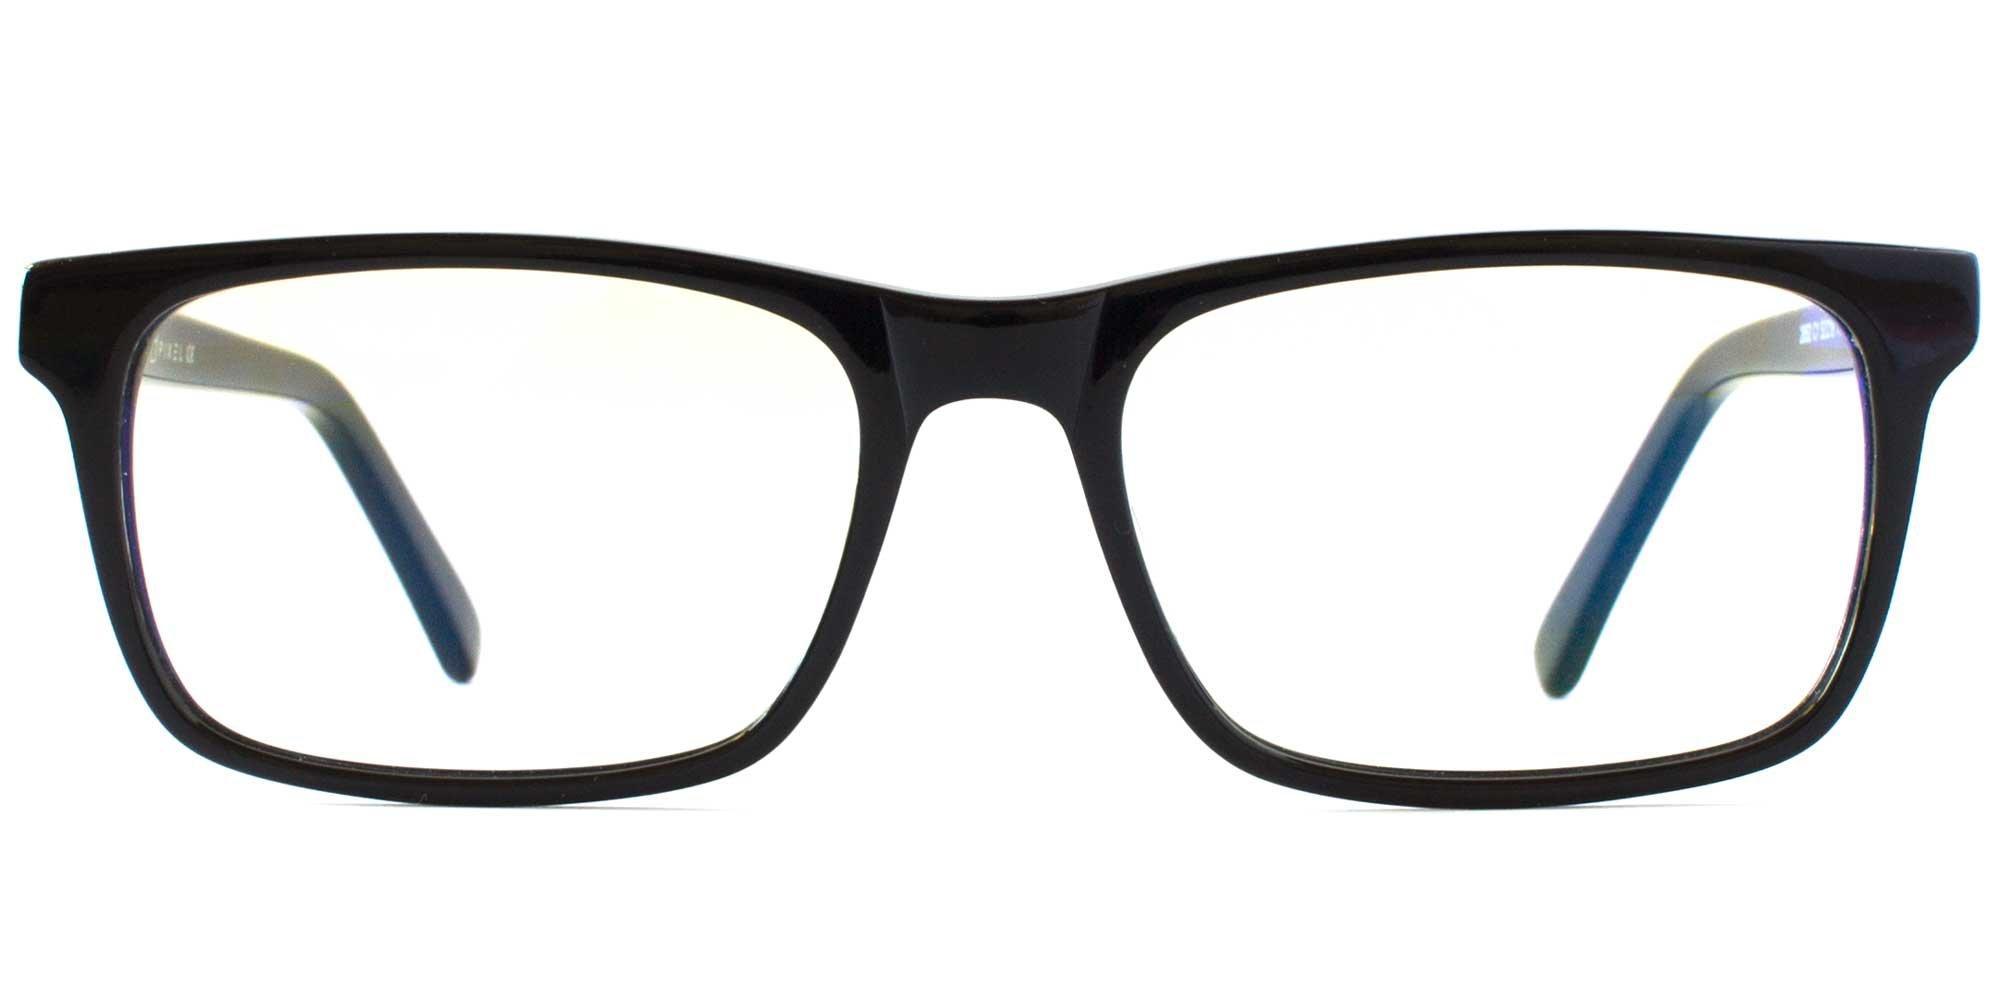 Pixel Eyewear Designer Computer Glasses with Anti-Blue Light Tint UV  Protection, Anti- 89e76becdb33